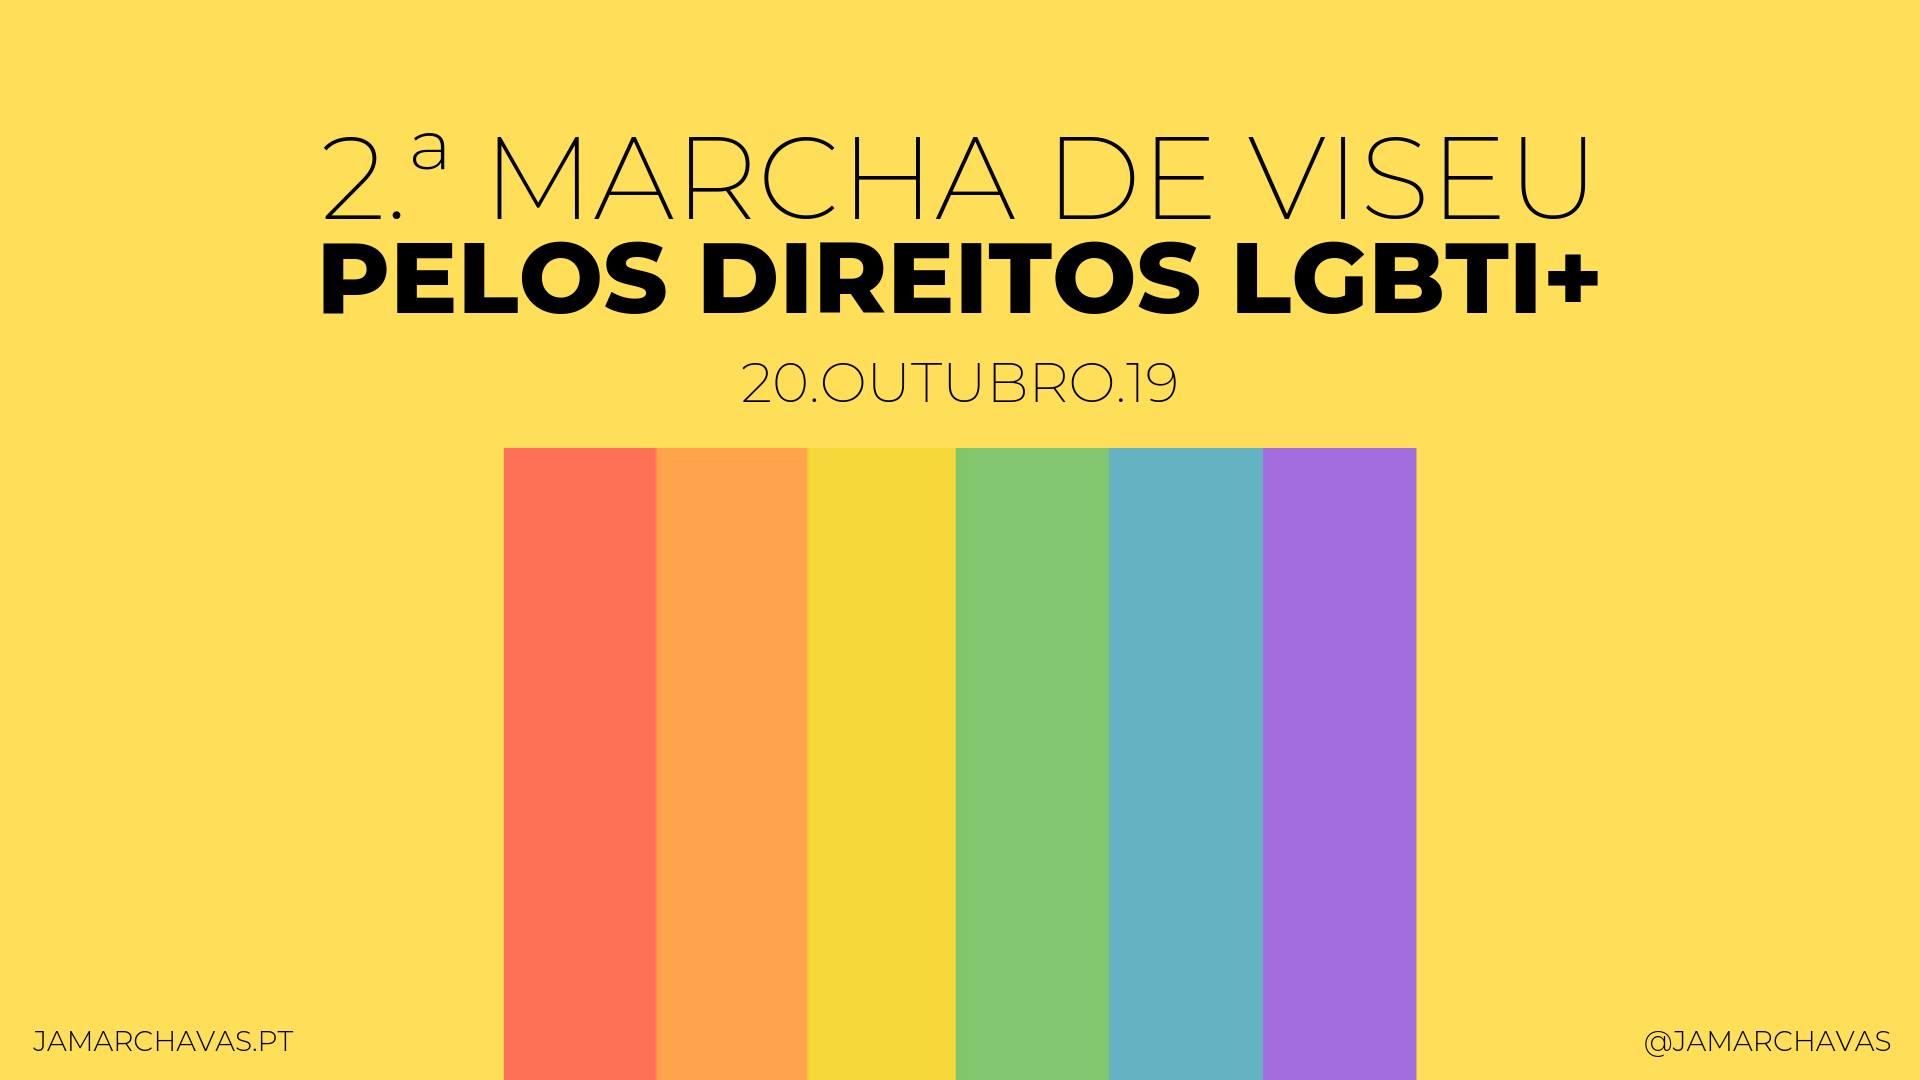 Marchar, 50 anos depois de Stonewall e sempre!